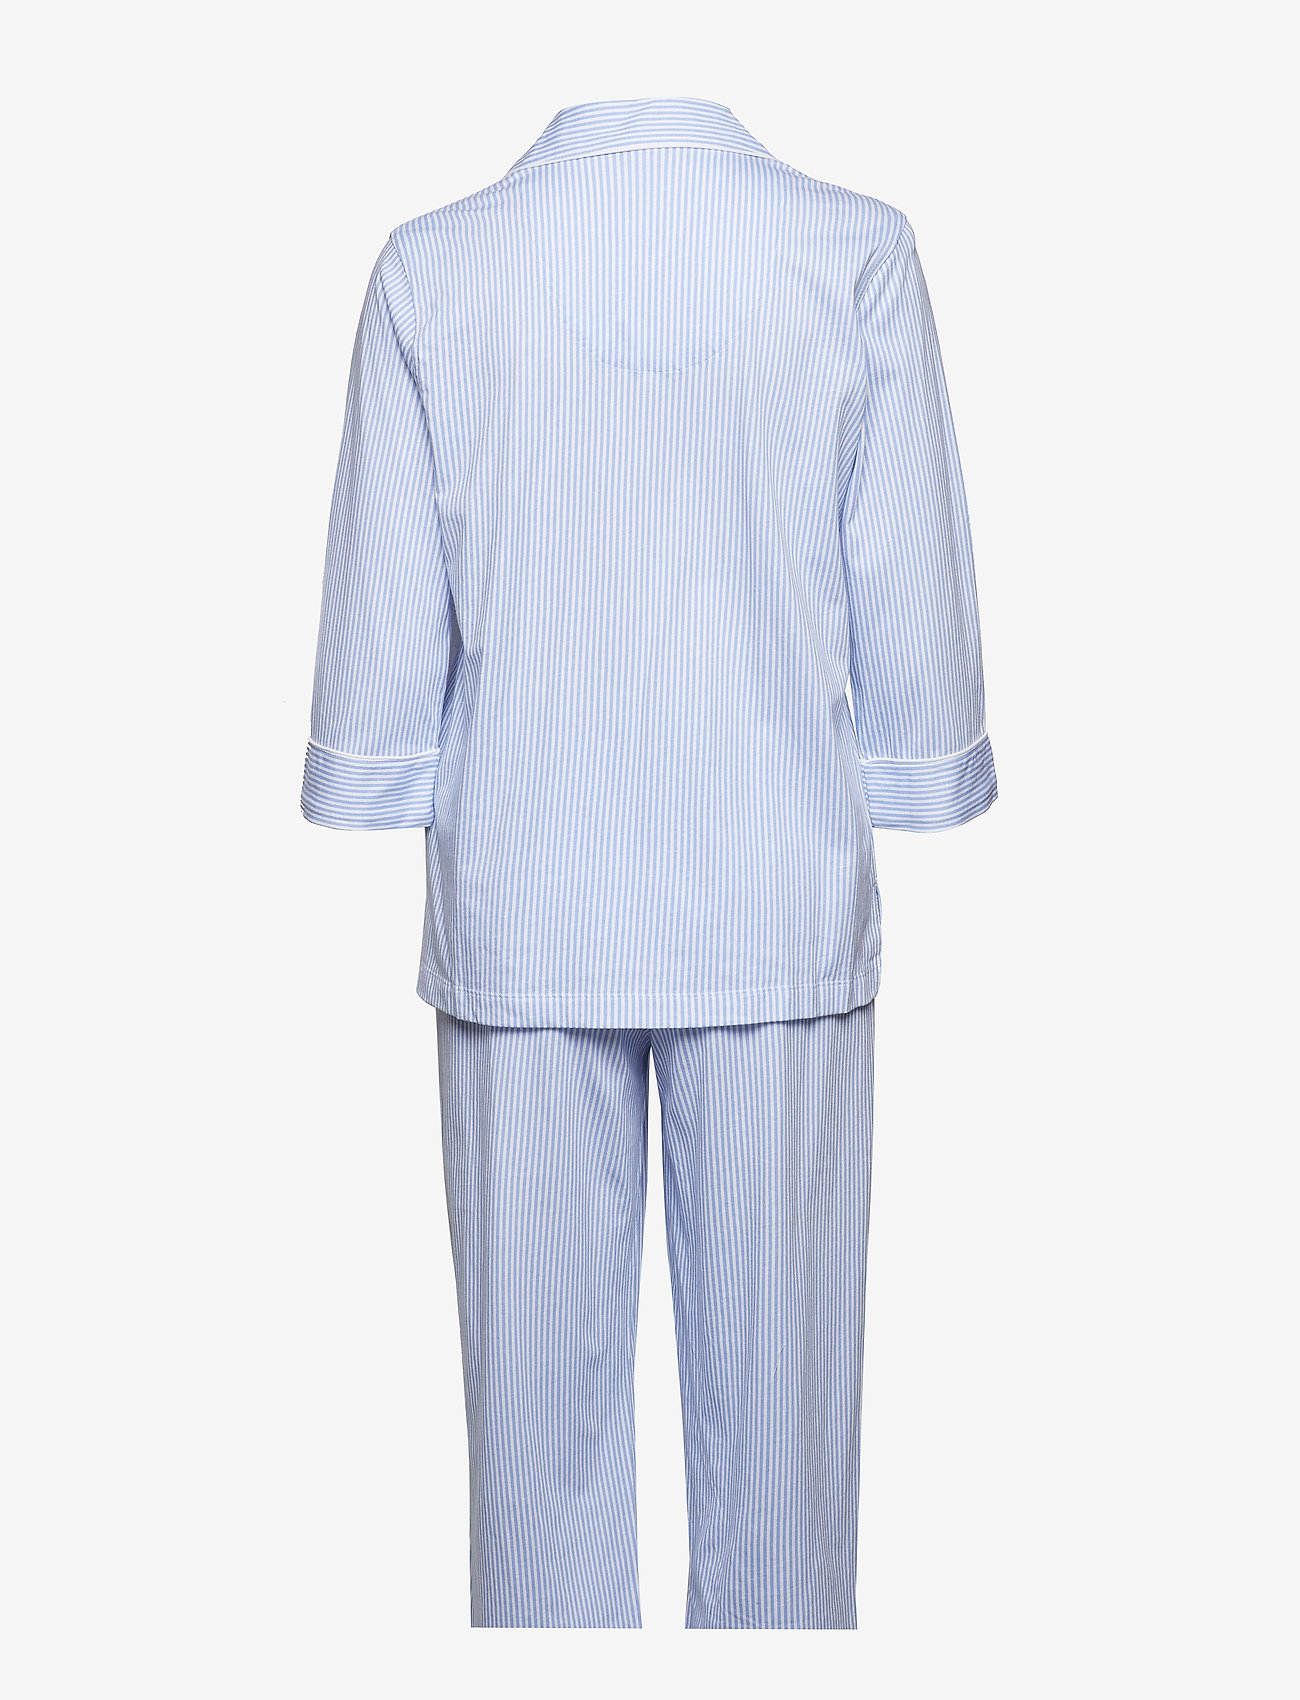 Lauren Ralph Lauren Homewear - LRL HERITAGE 3/4 SL CLASSIC NOTCH PJ SET - pyjama''s - french blue/white stripe - 1